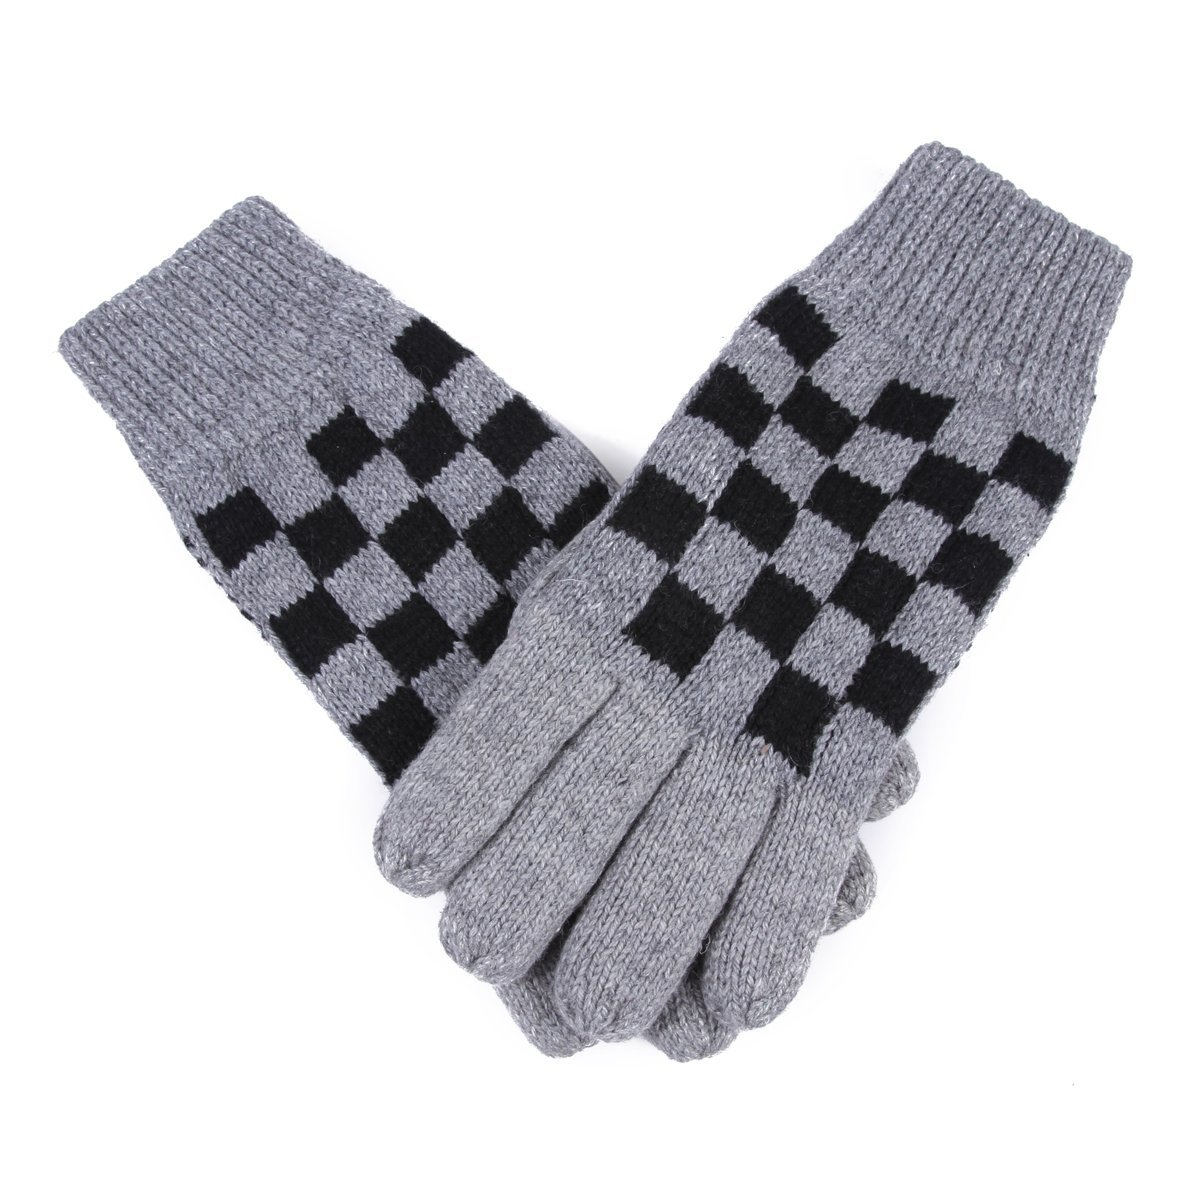 Damara Men & Boys Chessboard Pattern Warm Magic Gloves,Light Grey